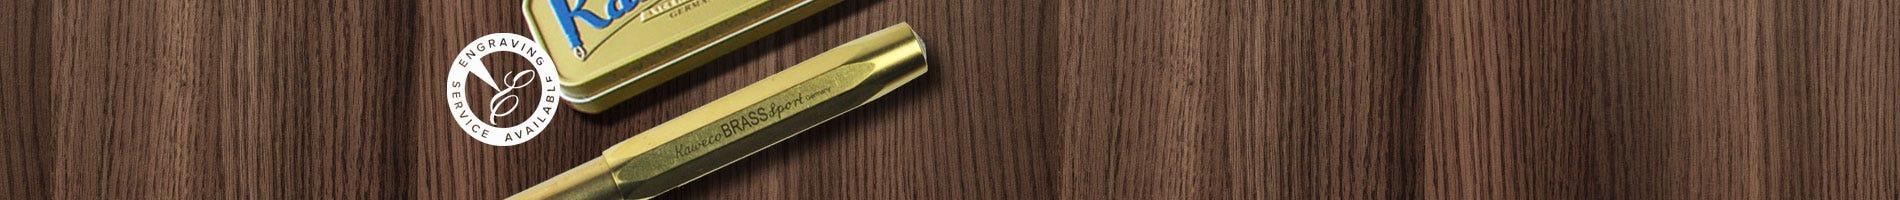 kaweco brass sport fountain pen